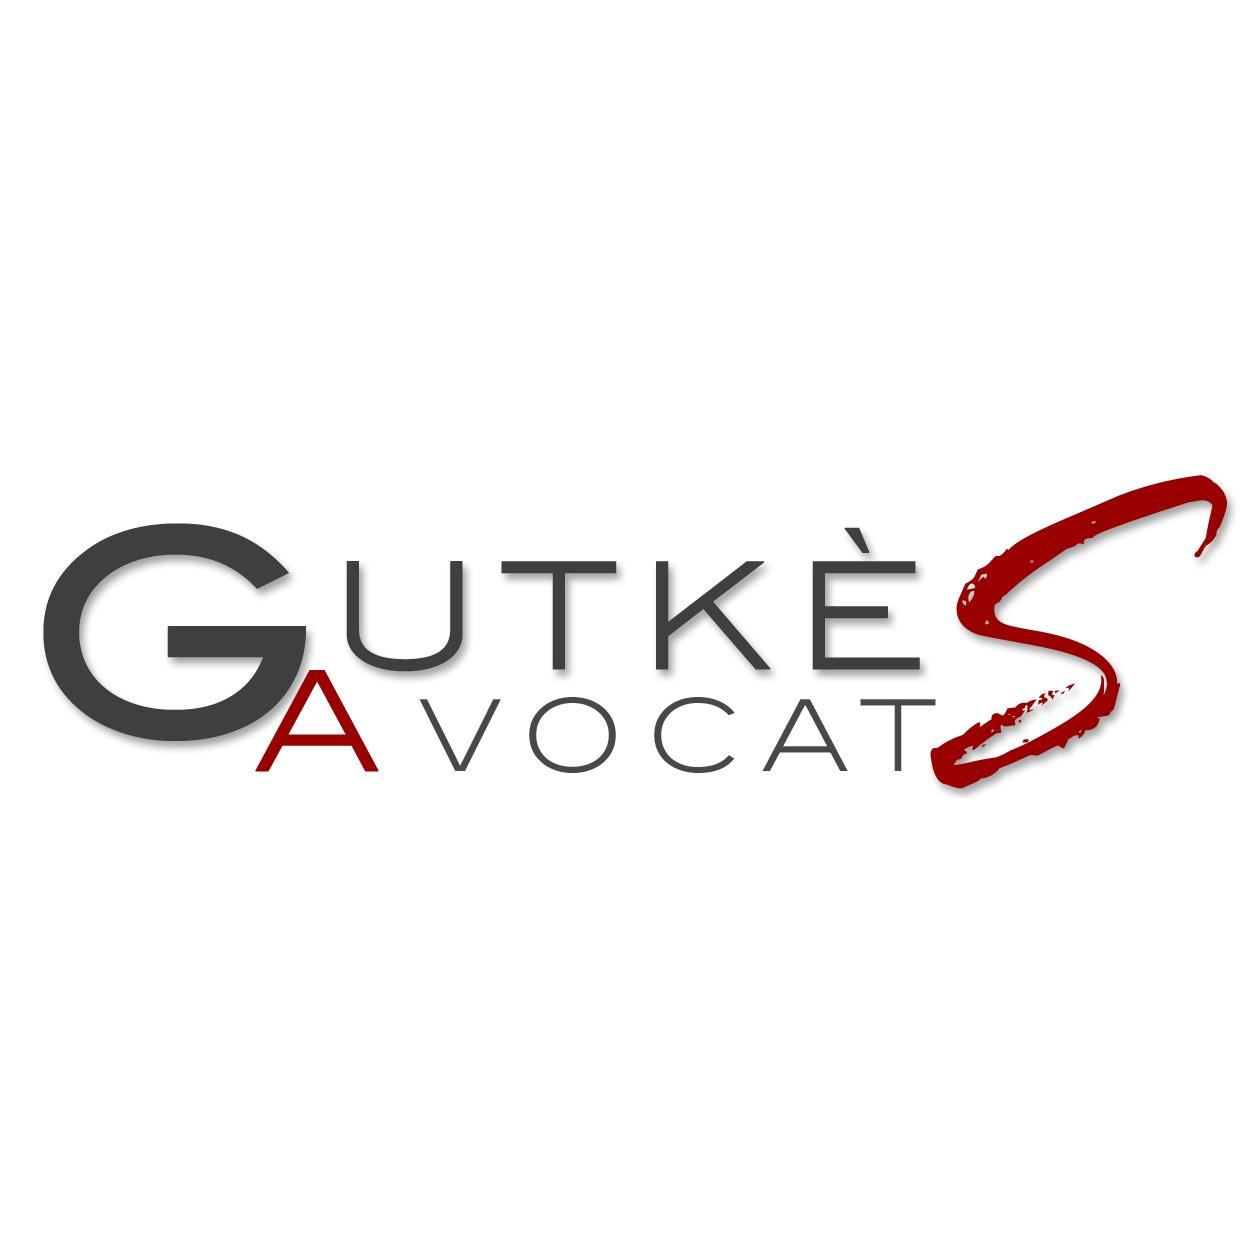 the Gutkès Avocats logo.